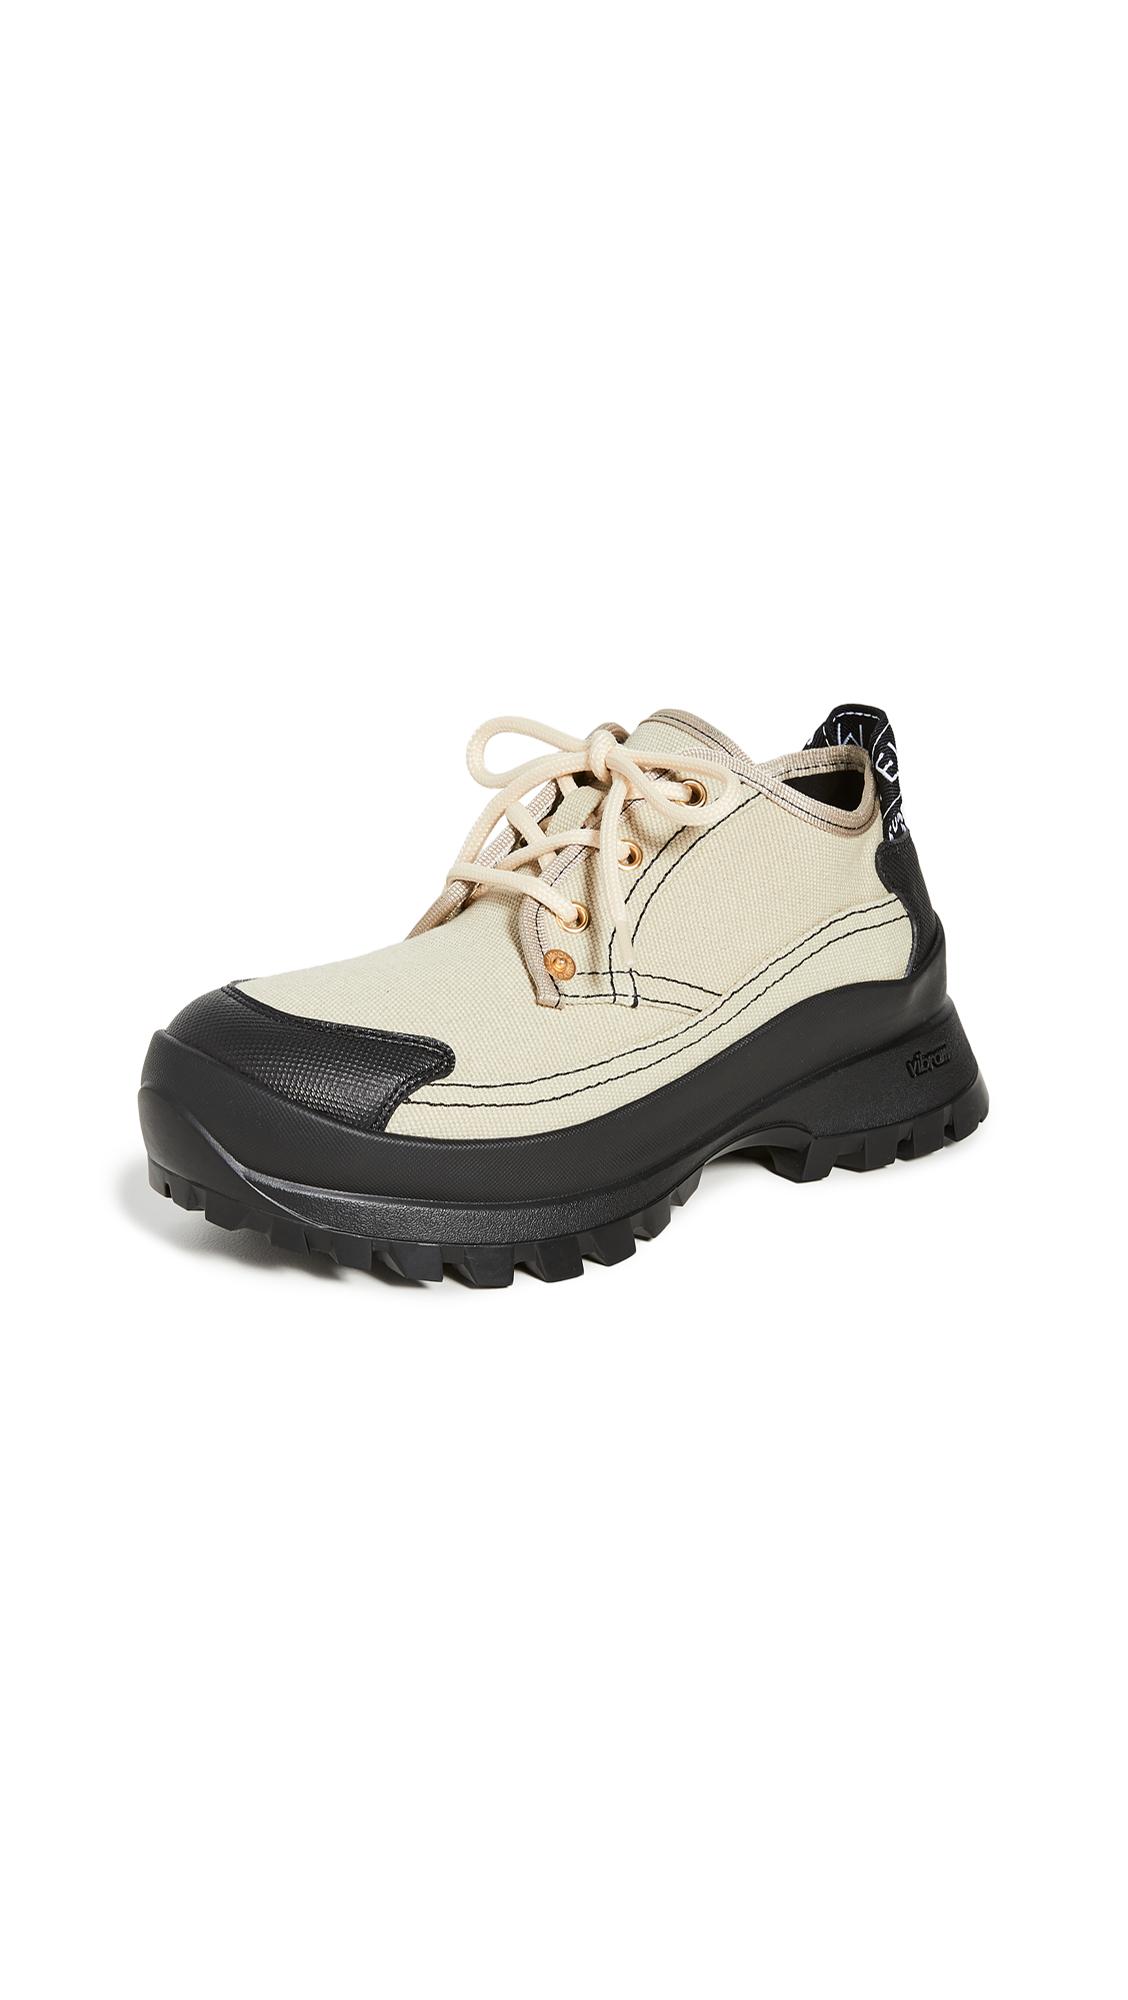 Stella McCartney Low Chunky Sneaker Boots - 40% Off Sale